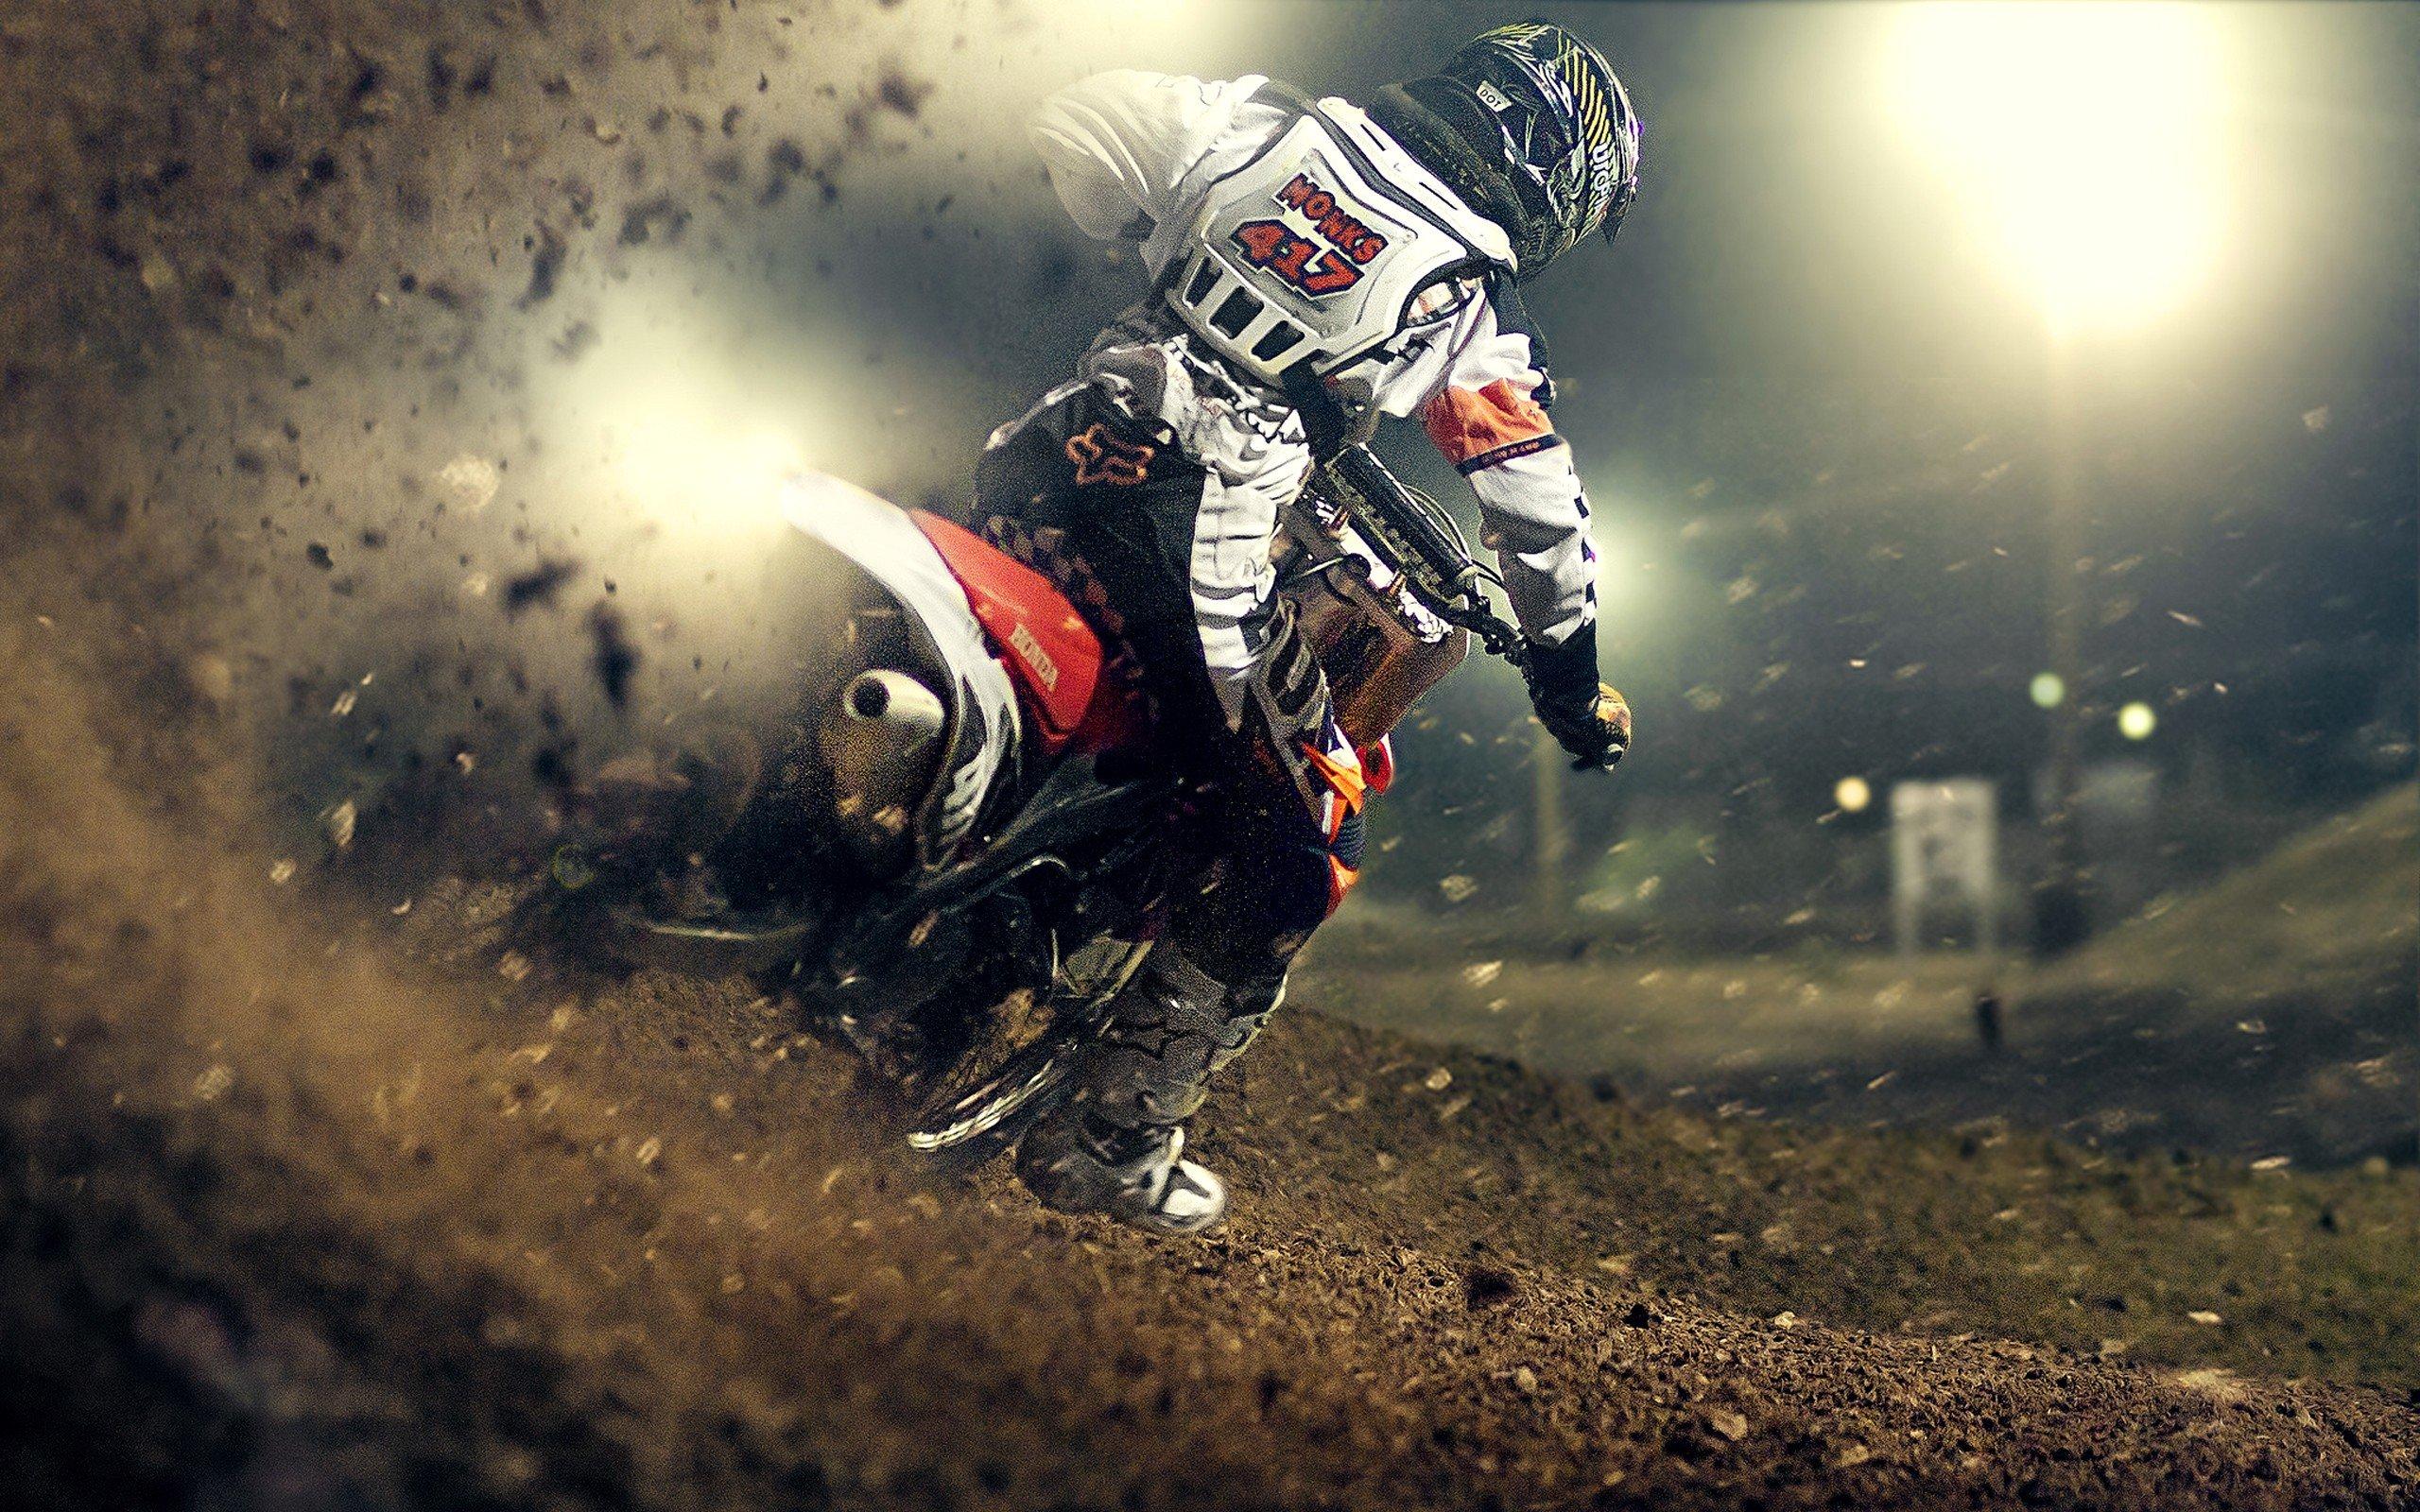 wallpapers hd motos - photo #44